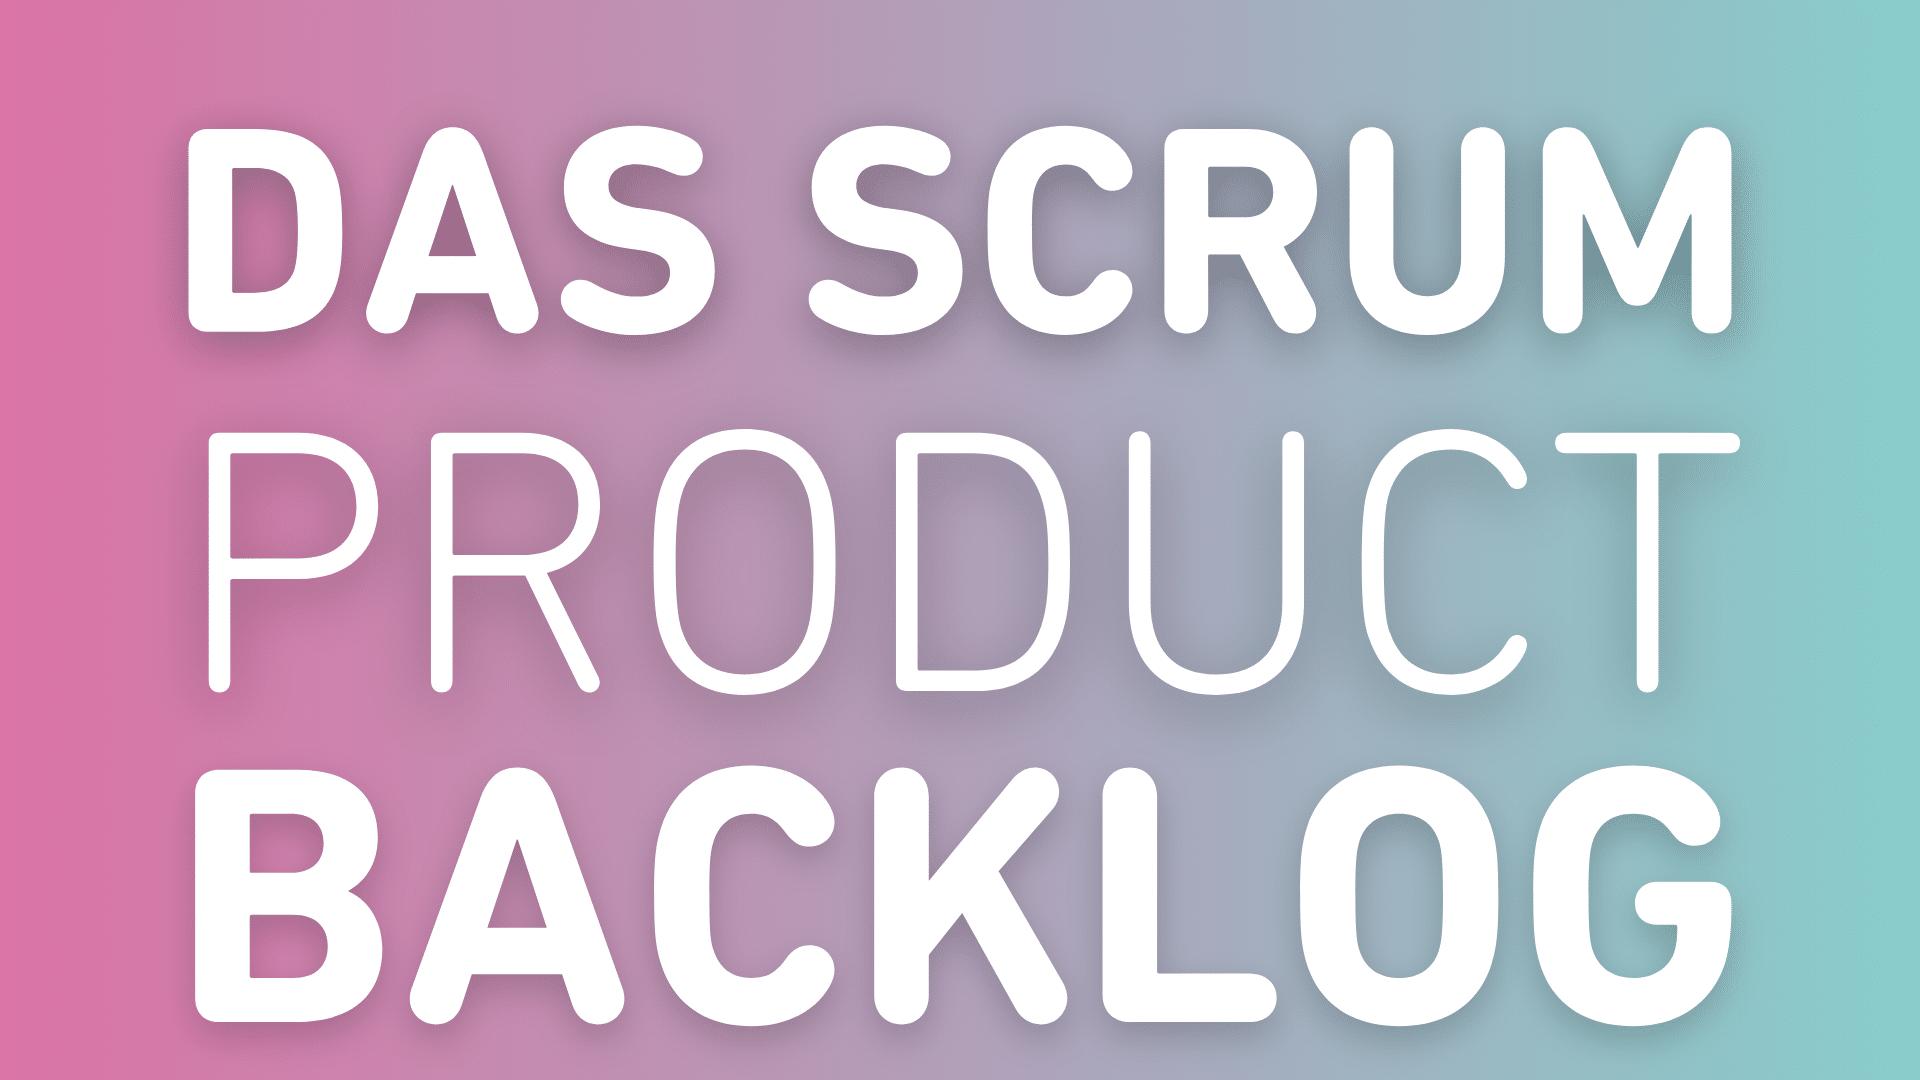 Das Scrum Product Backlog